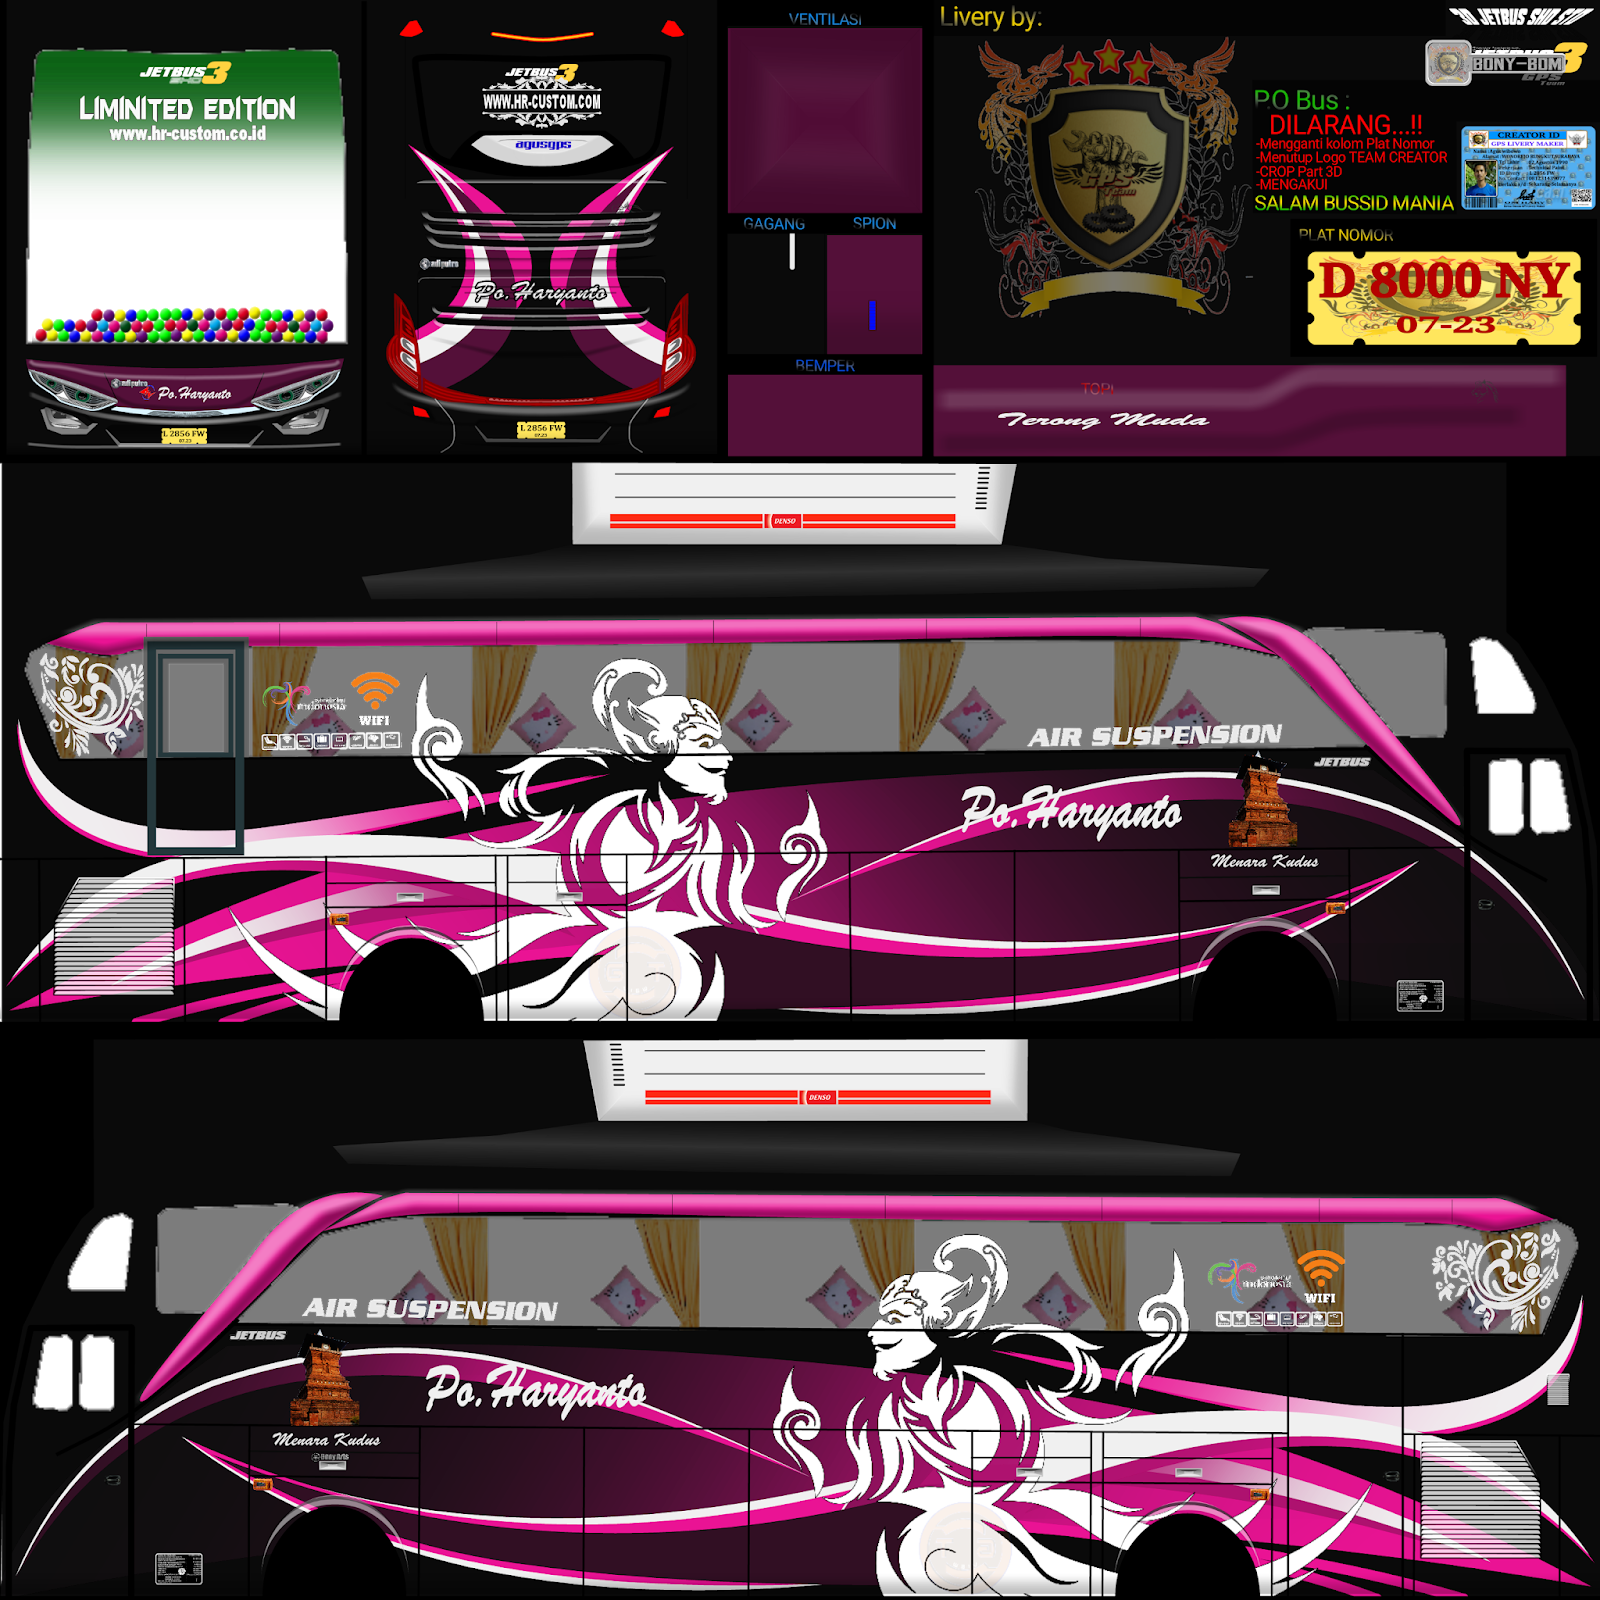 87 Livery Bussid Hd Shd Jernih Koleksi Pilihan Part 2 Raina Id Konsep Mobil Desain Decal Mobil Pertama